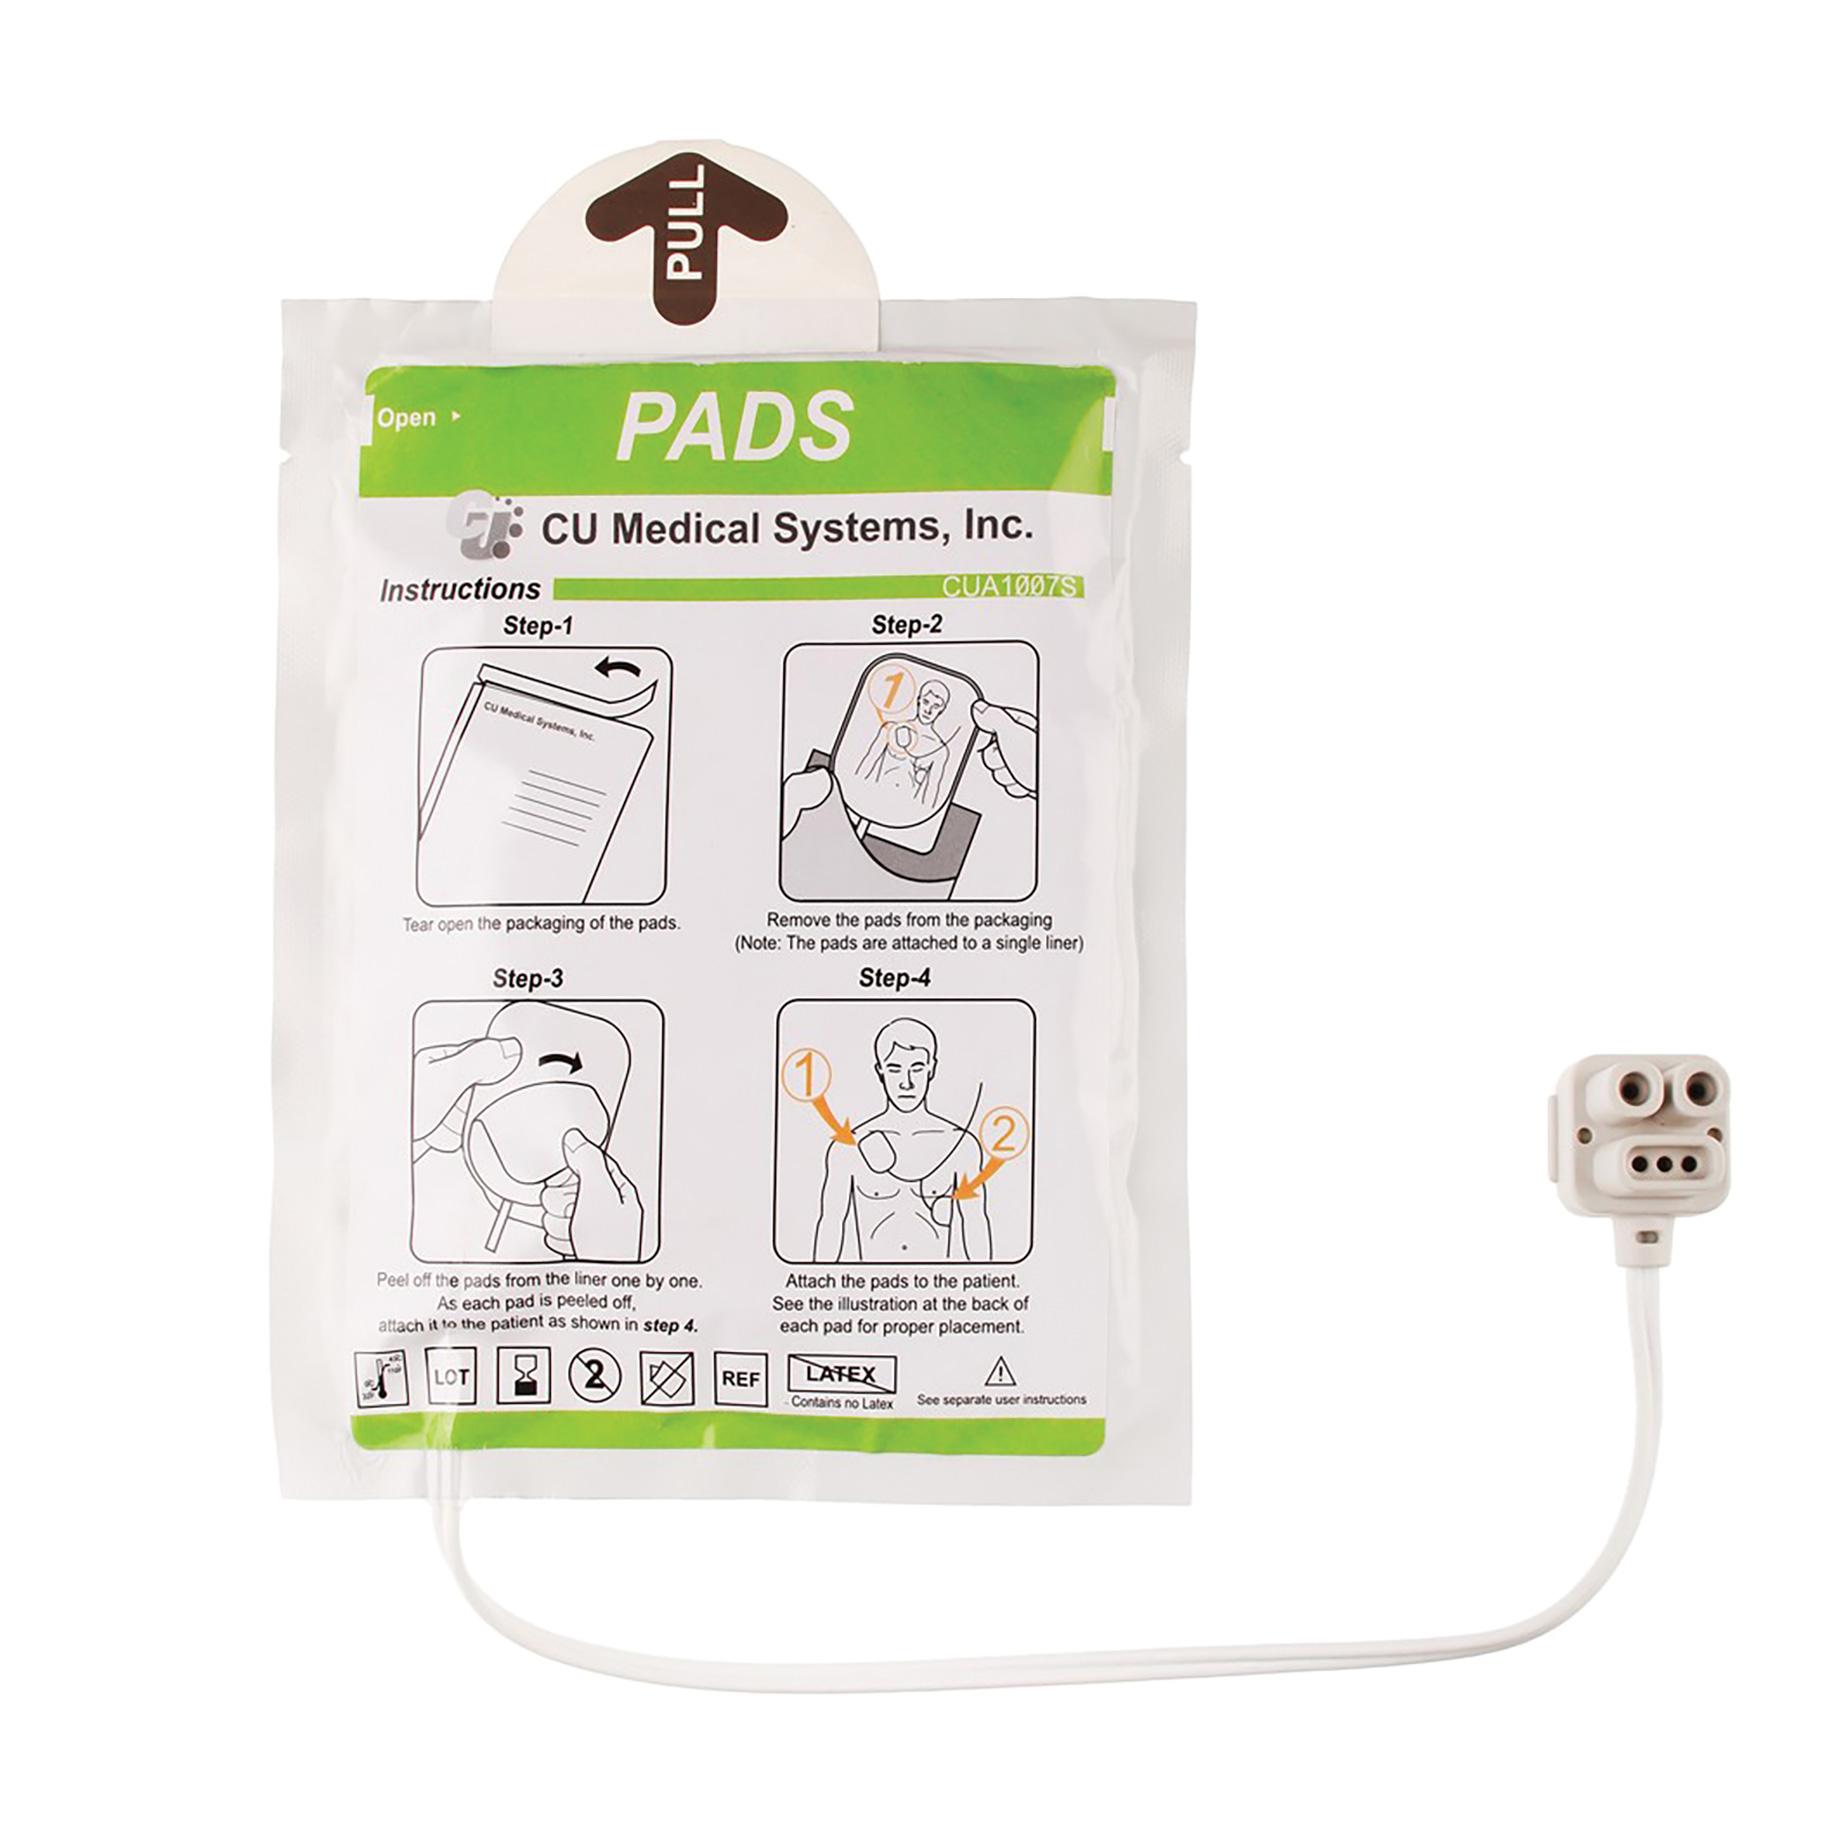 SP1 Ipad Defibrillator Pads